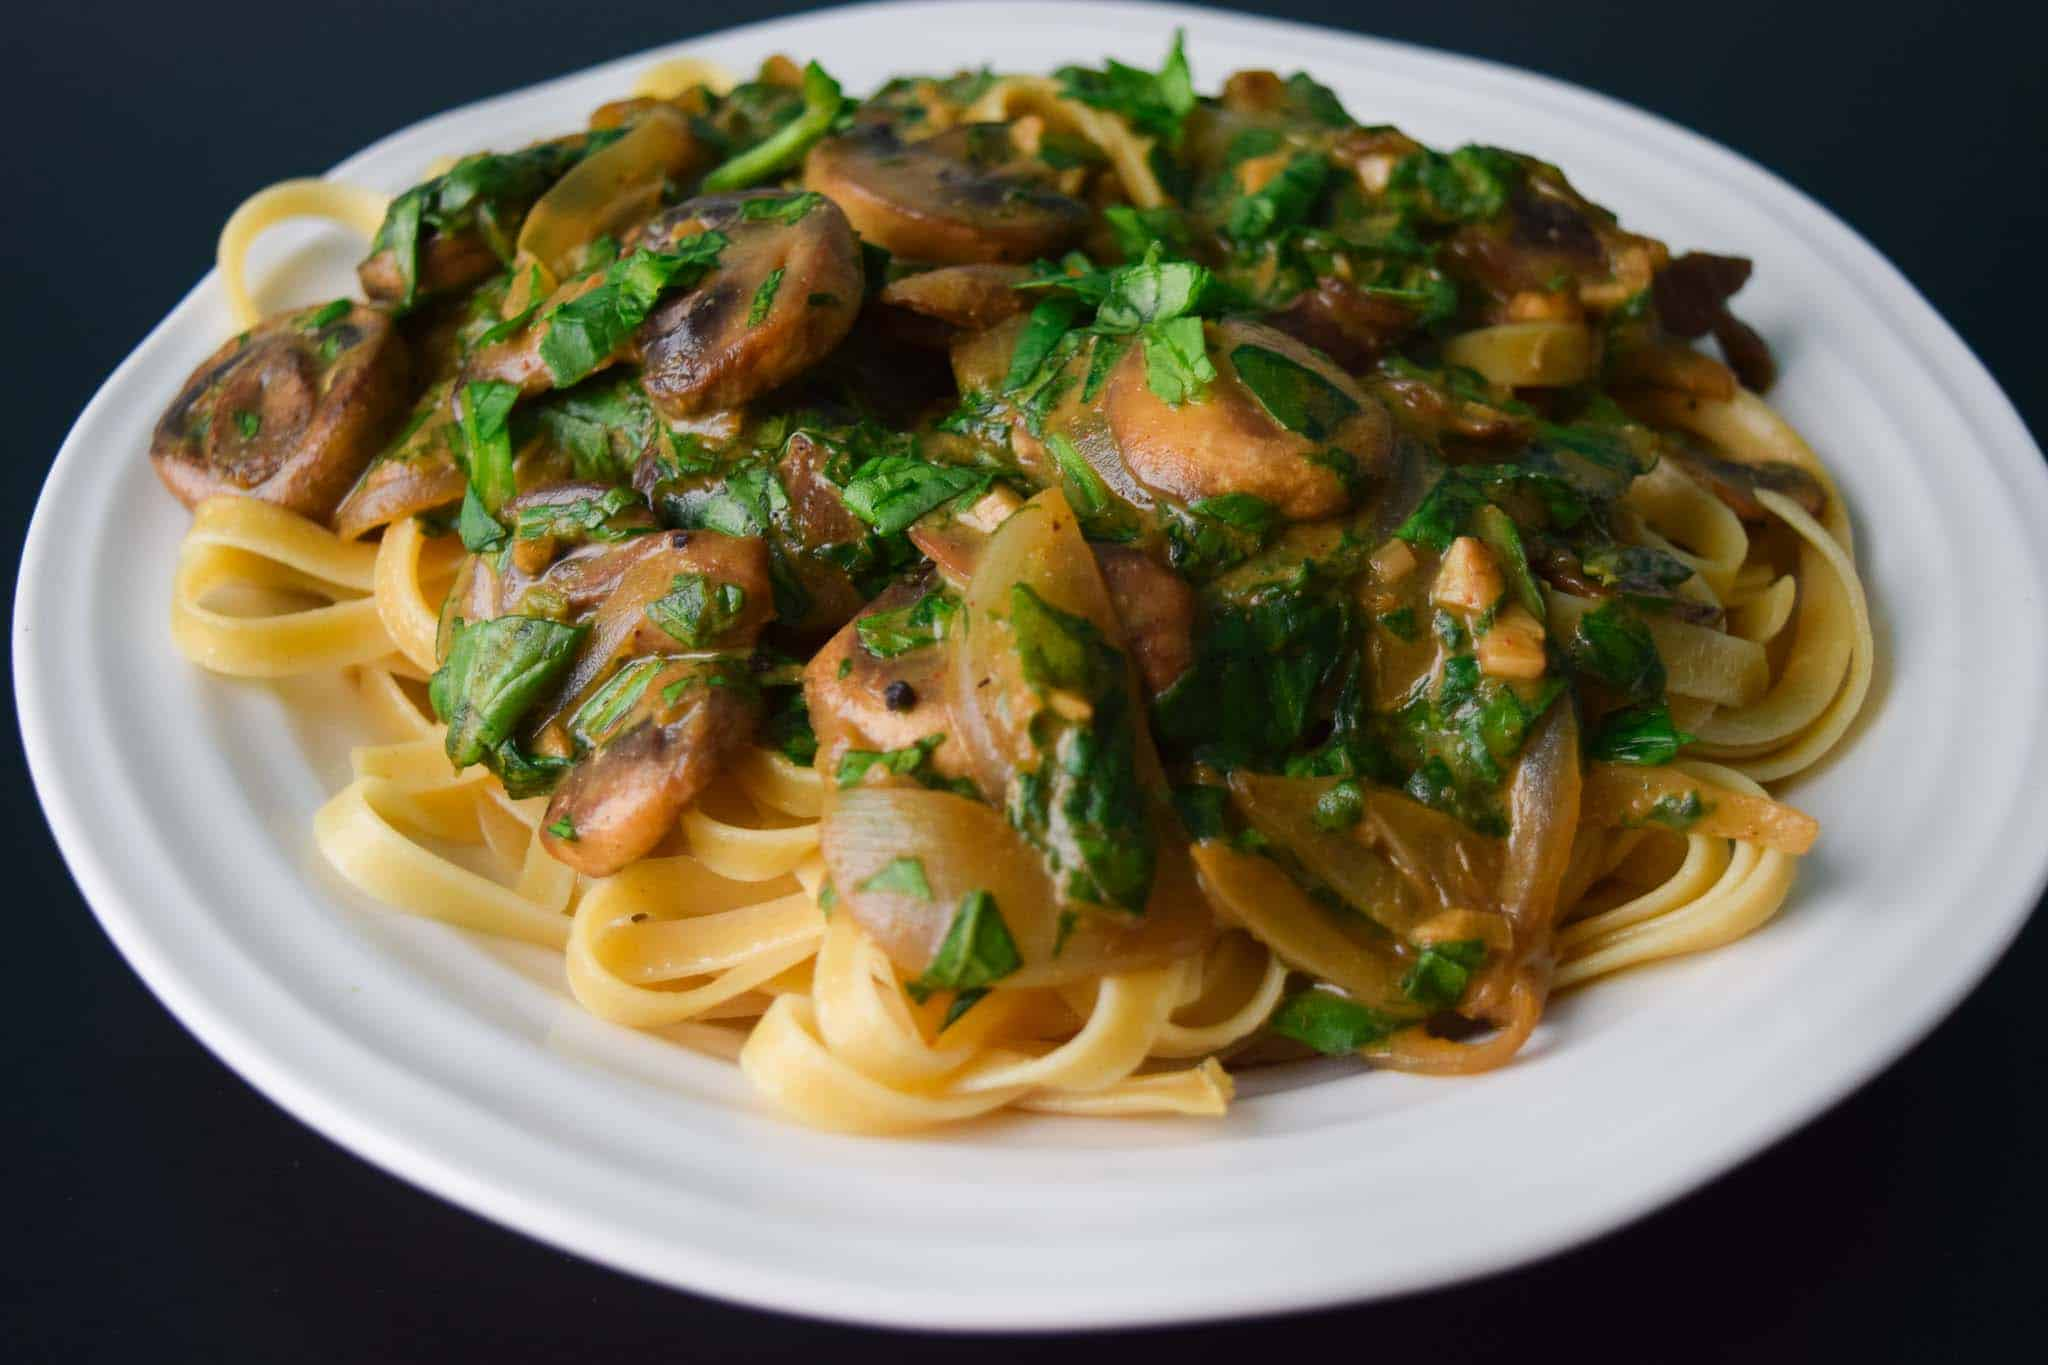 Spinach and Mushroom Fettuccine